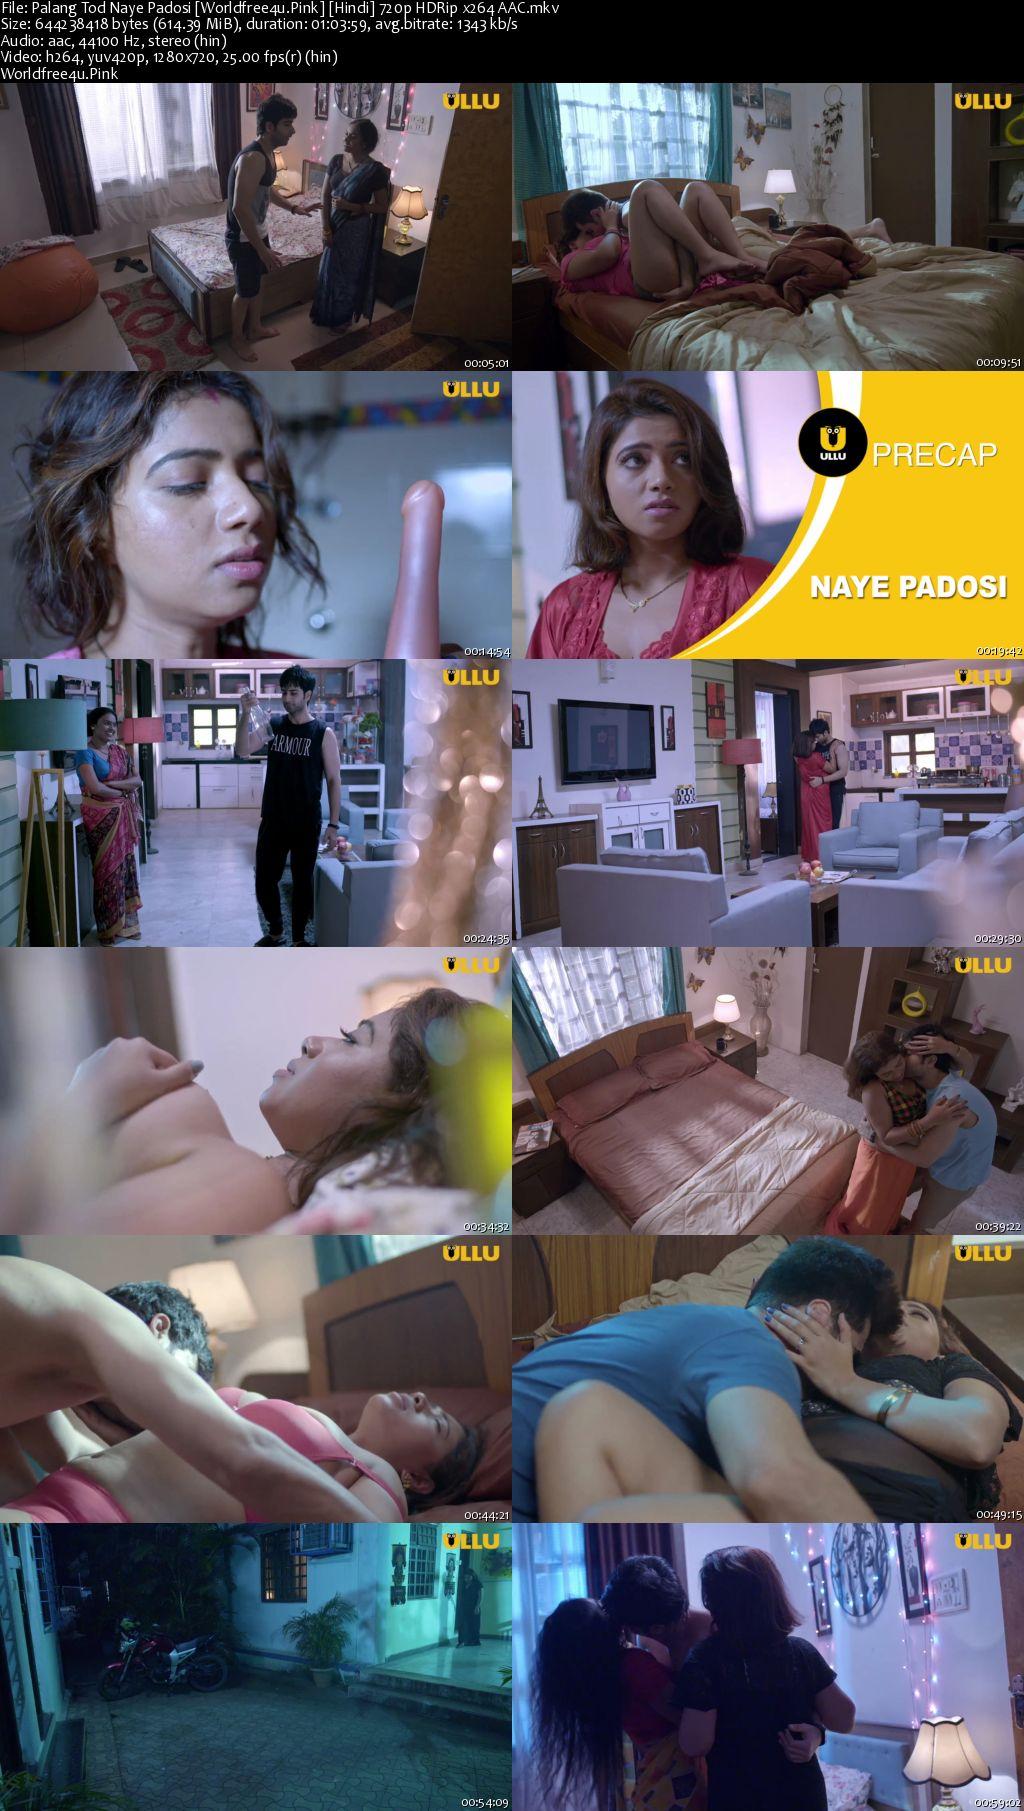 Palang Tod: Naye Padosi 2021 Hindi Episode HDRip 720p